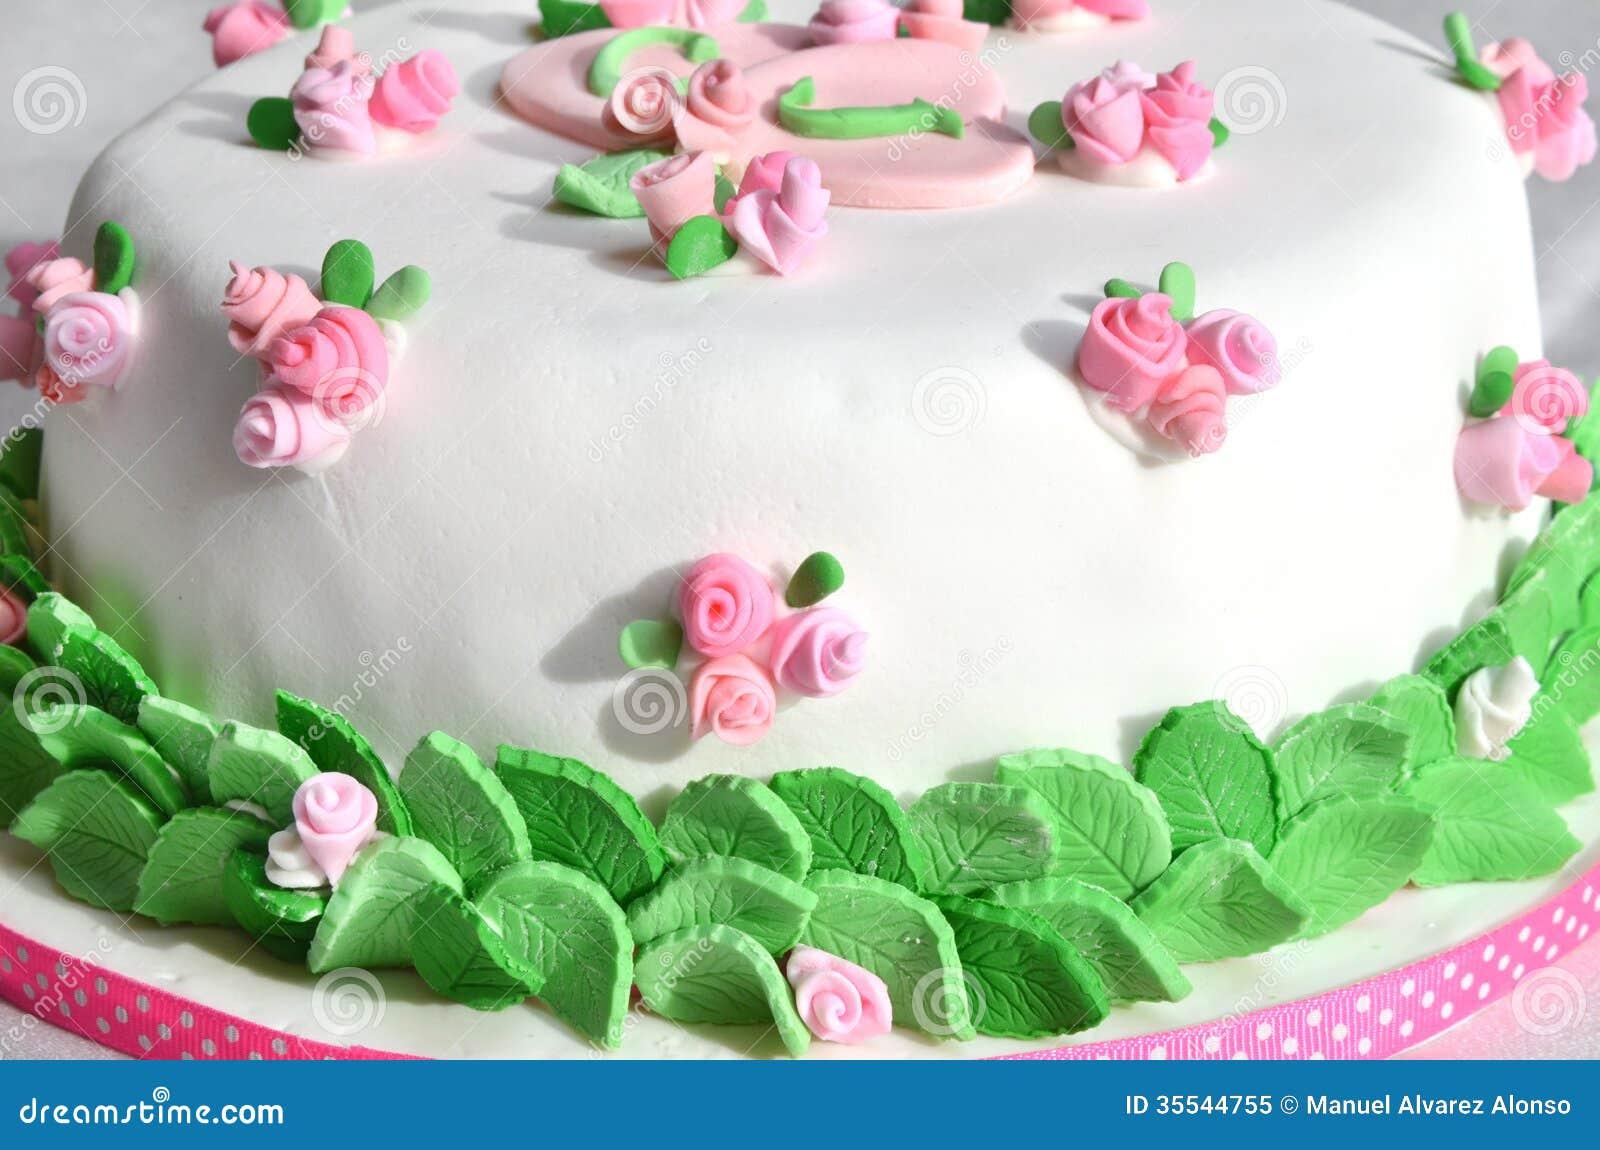 Birthday Cake Profile stock image. Image of household - 35544755